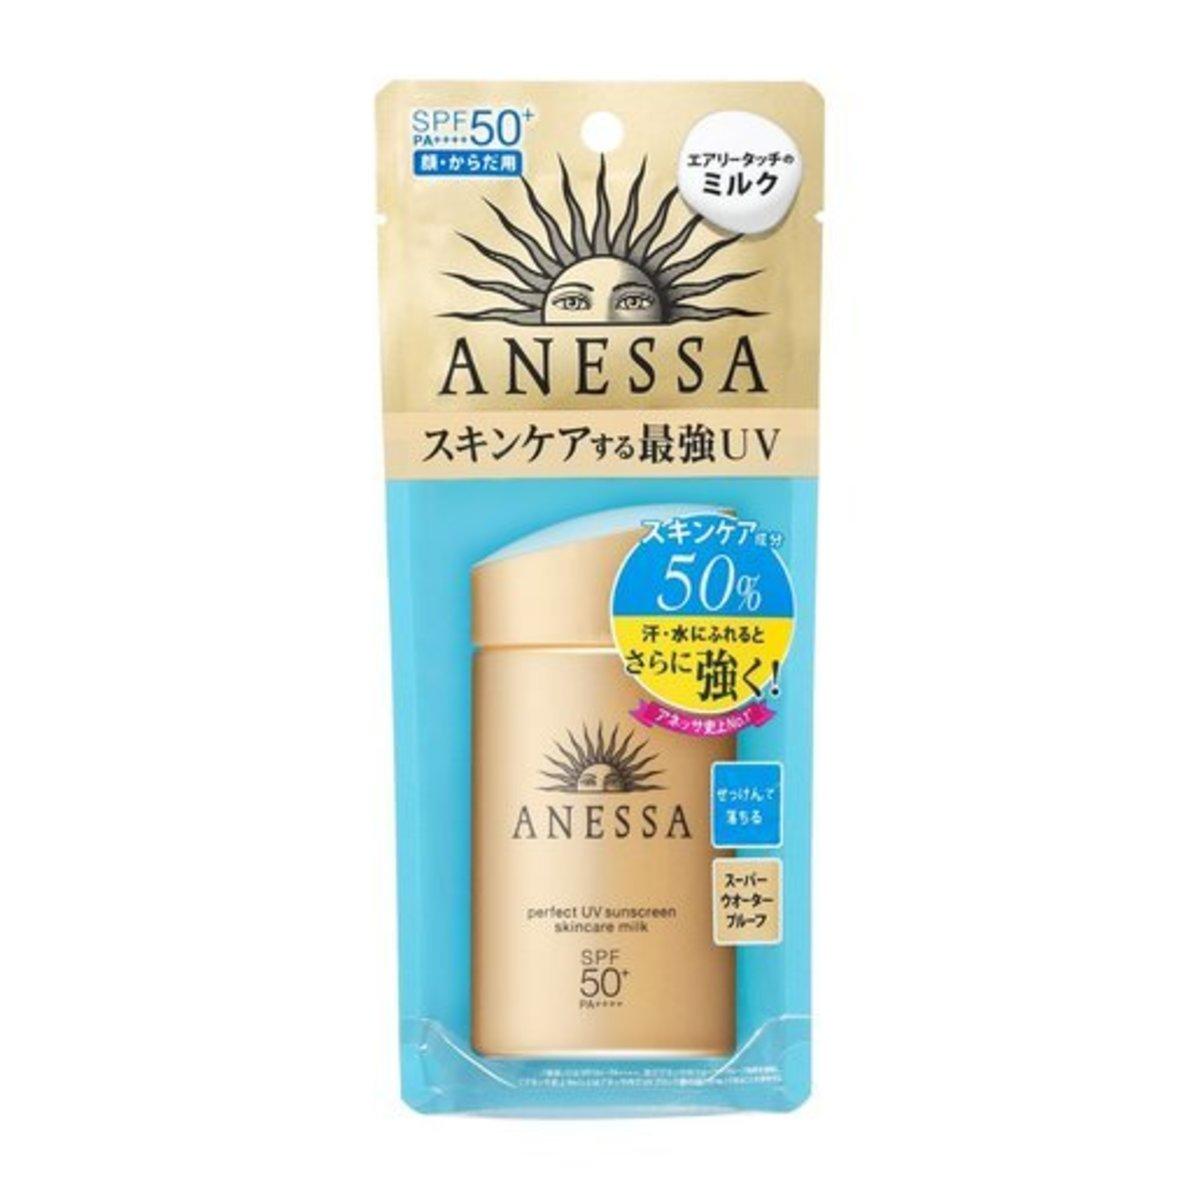 Perfect UV Sunscreen Skincare Milk 60ml (Parallel Import)